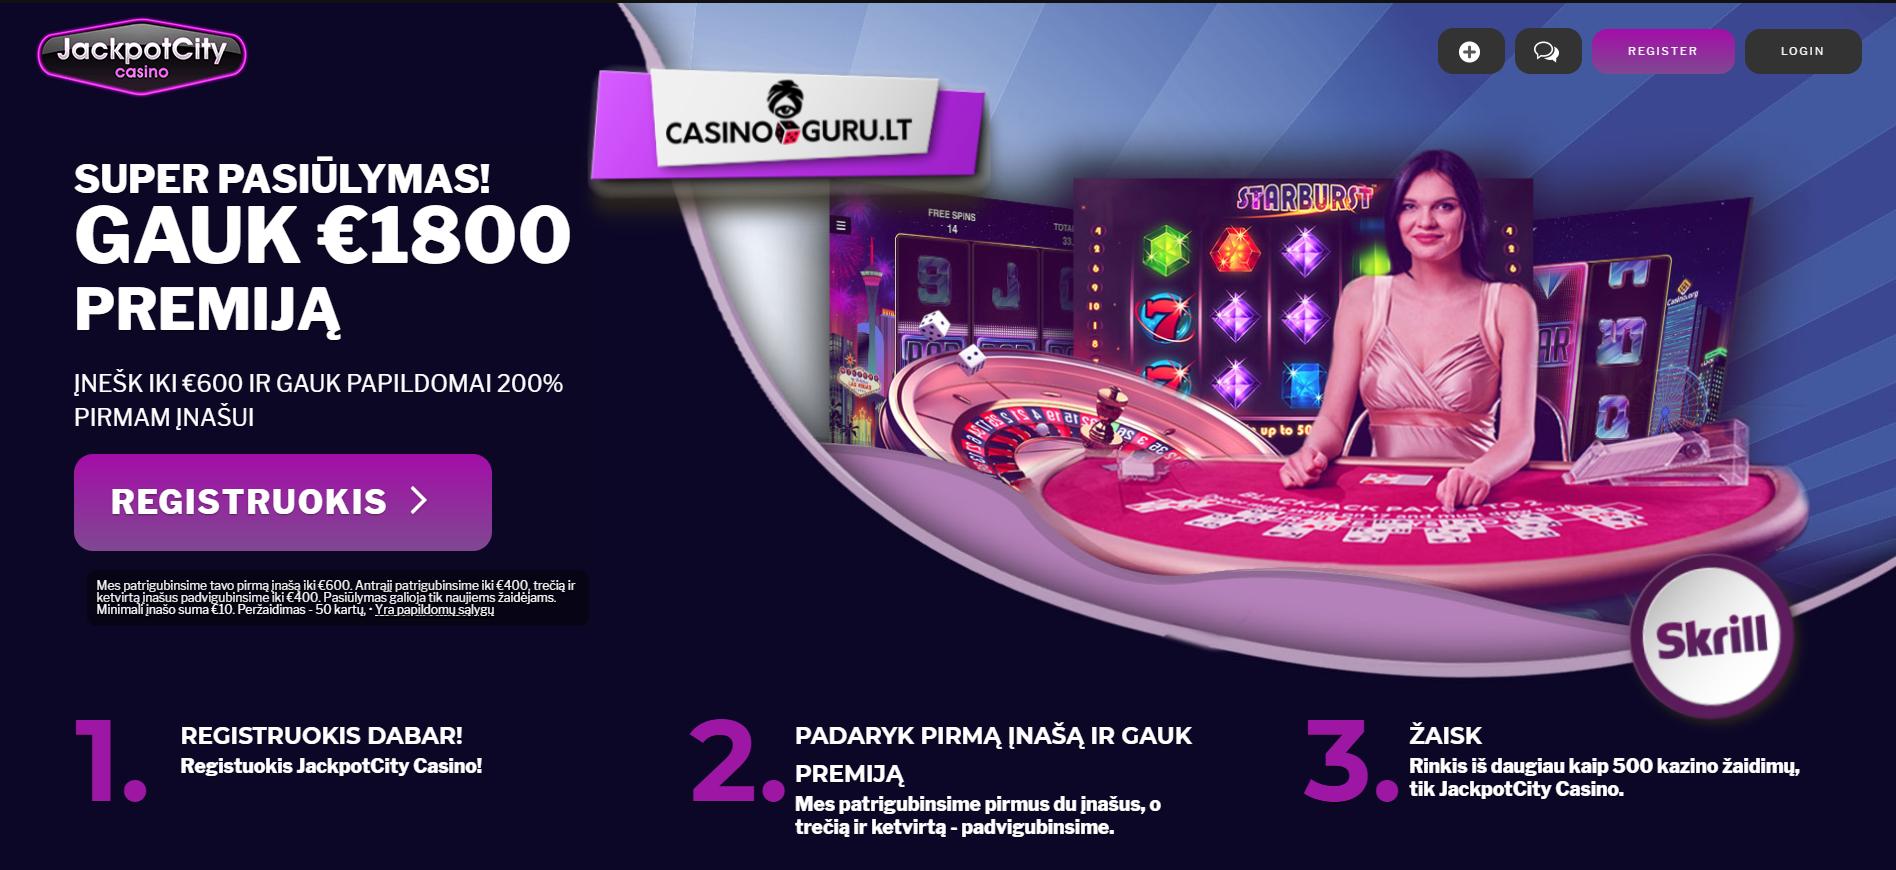 jackpot city casino bonus codes free spins - casinoguru akcija 1800€ kazino premija